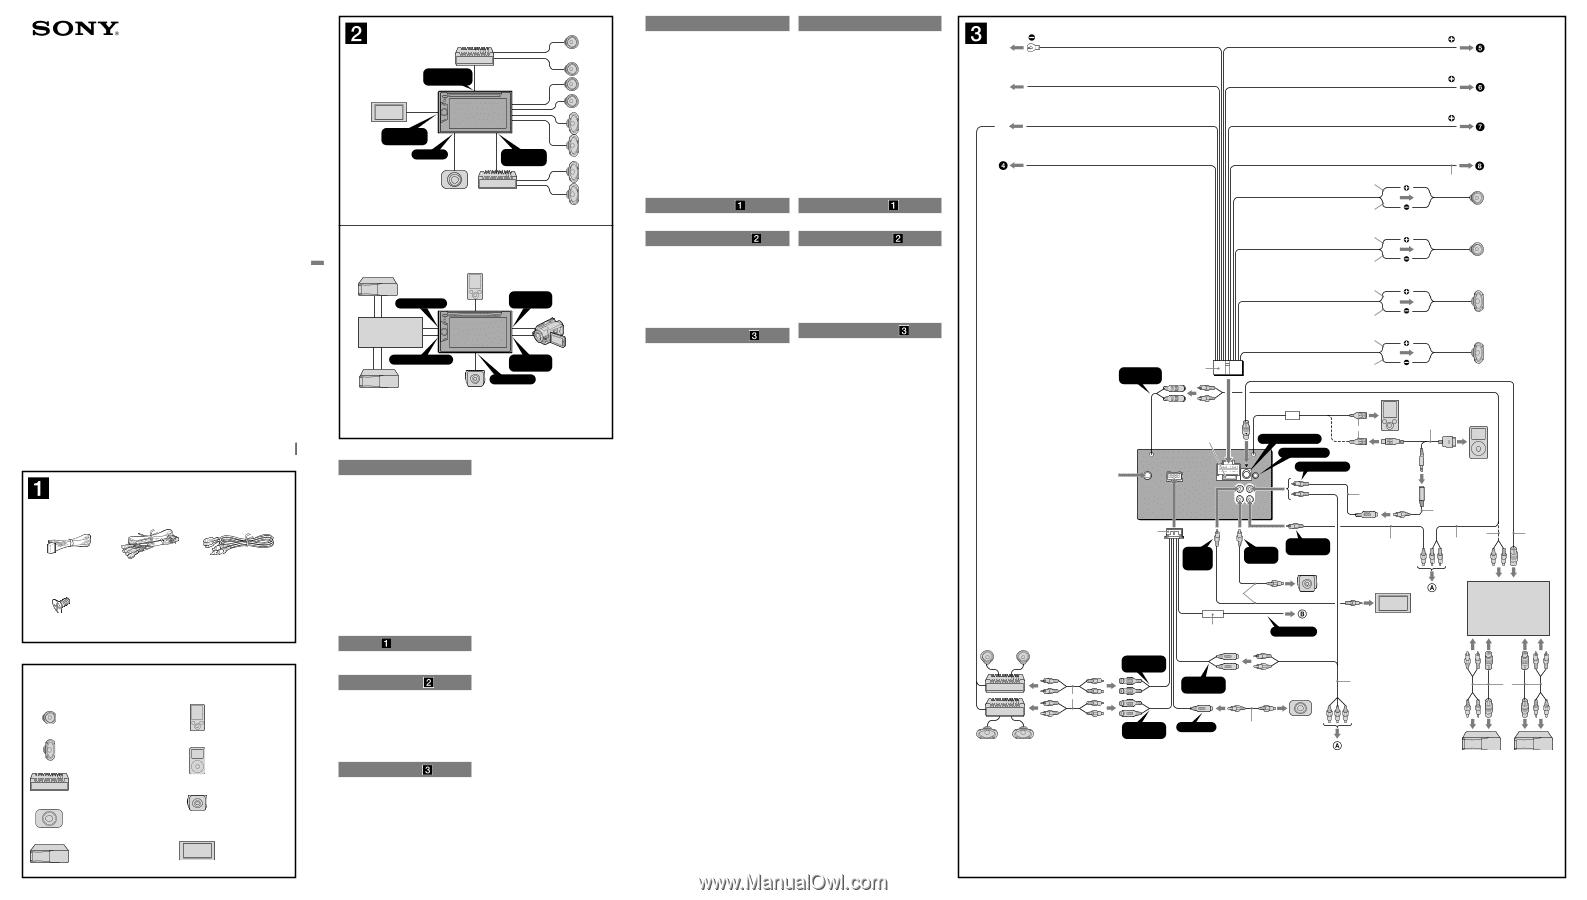 sony xav 60 wiring diagram